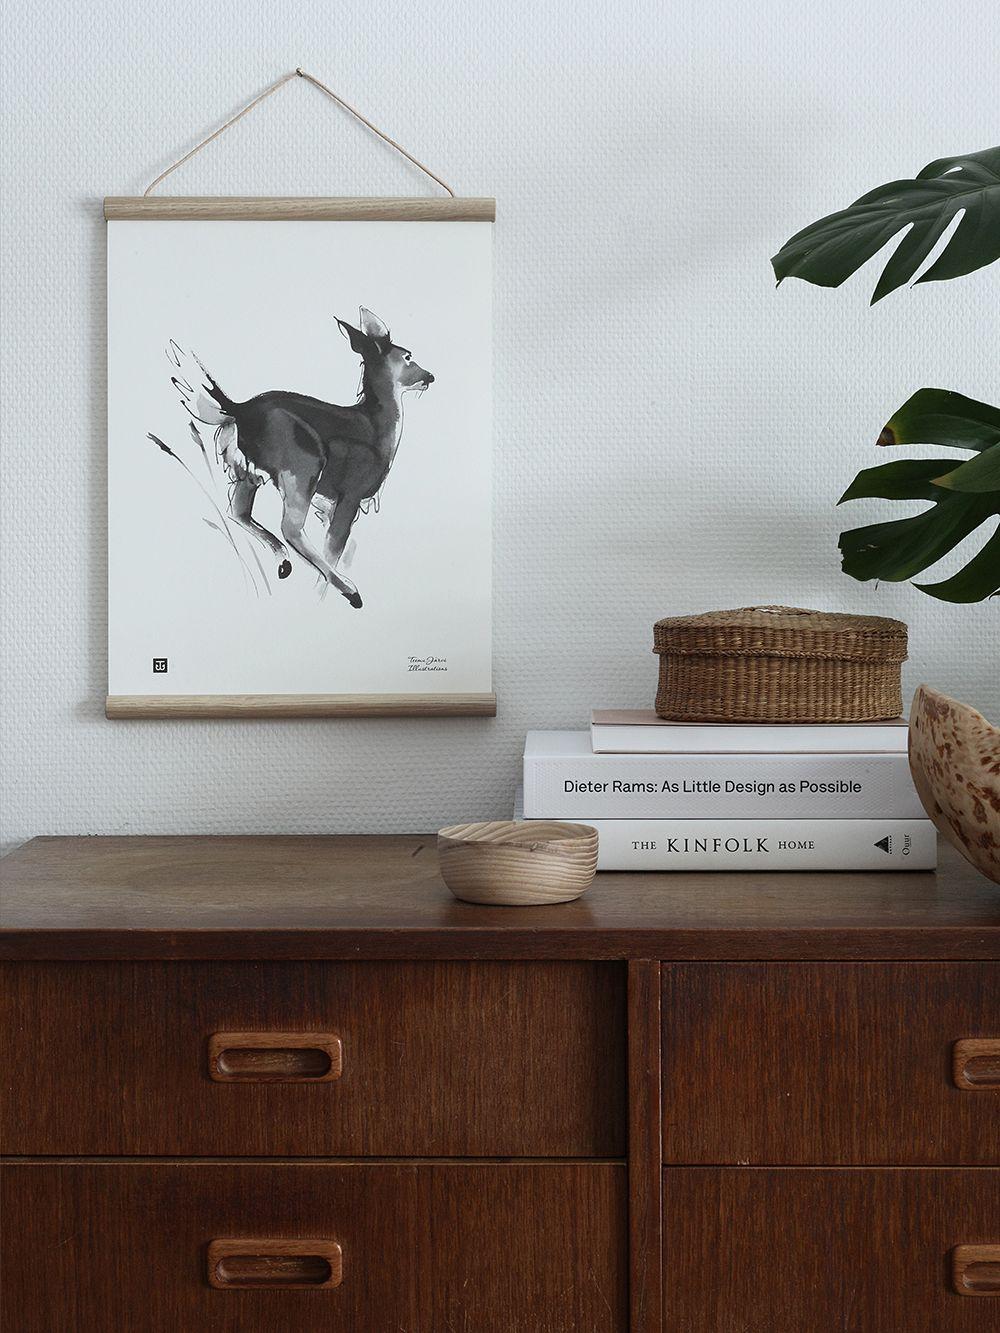 Teemu Järvi's White-Tailed Deer poster